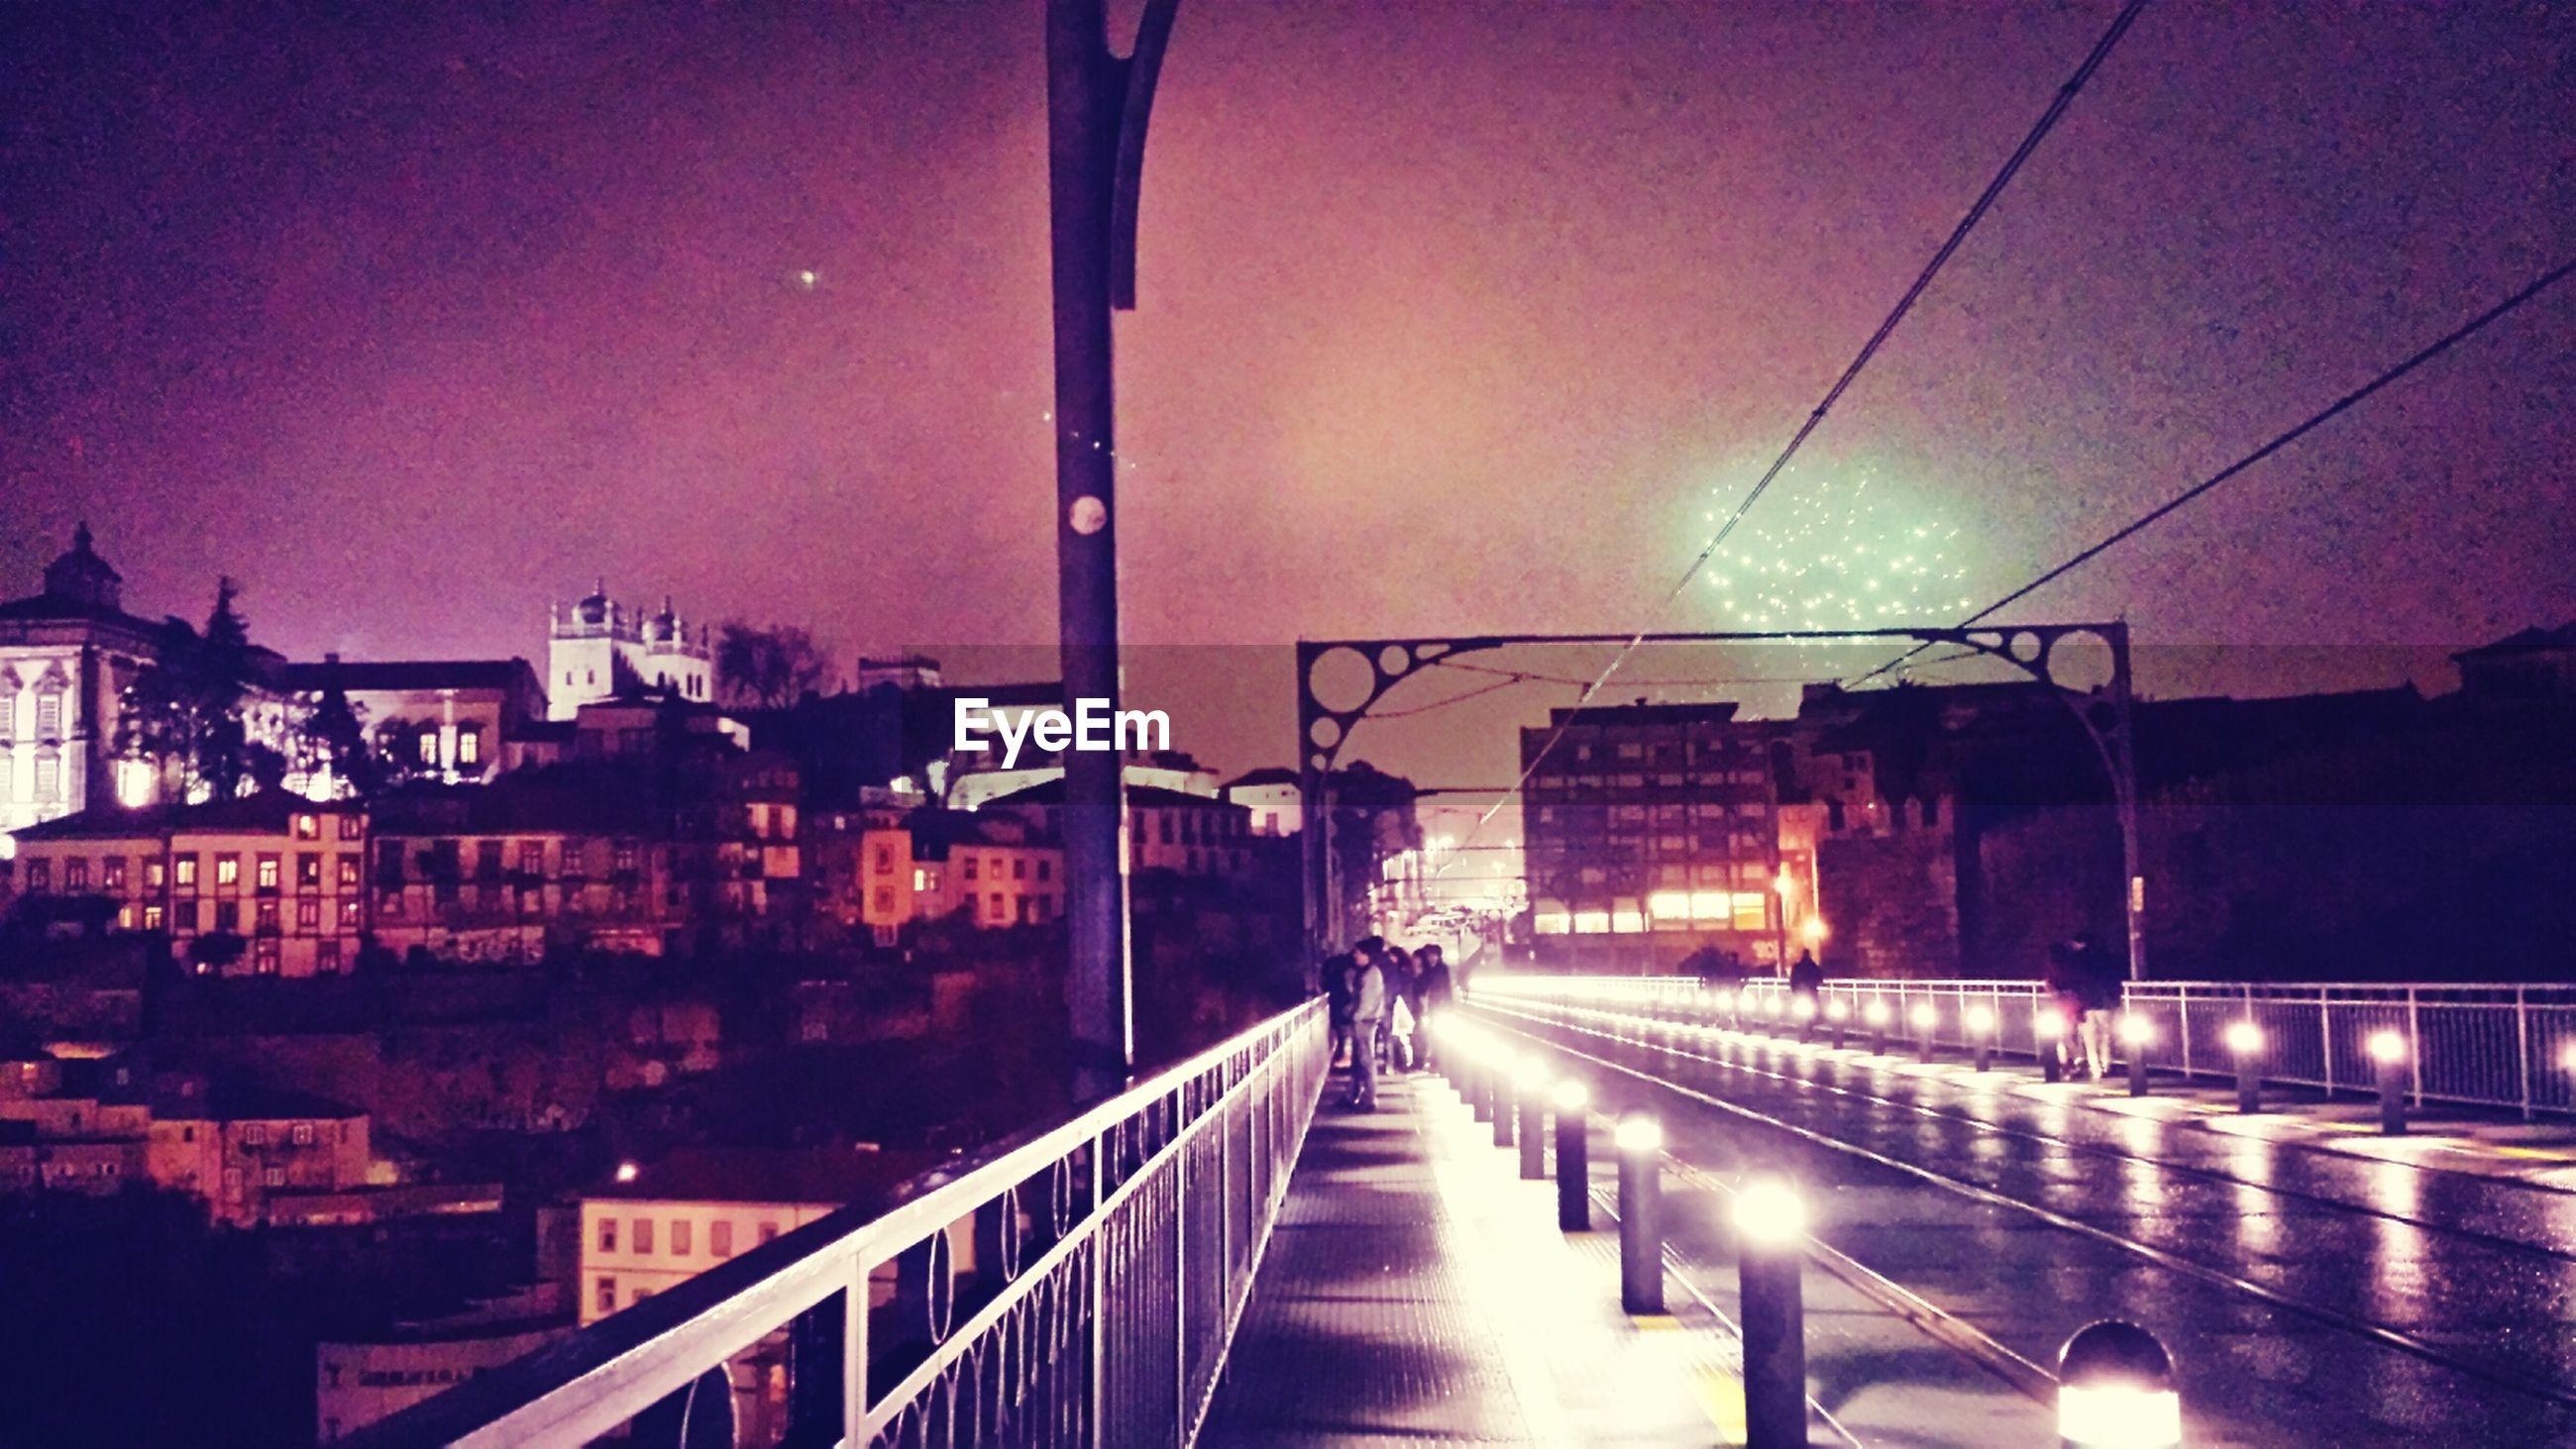 Illuminated street against sky at night in city